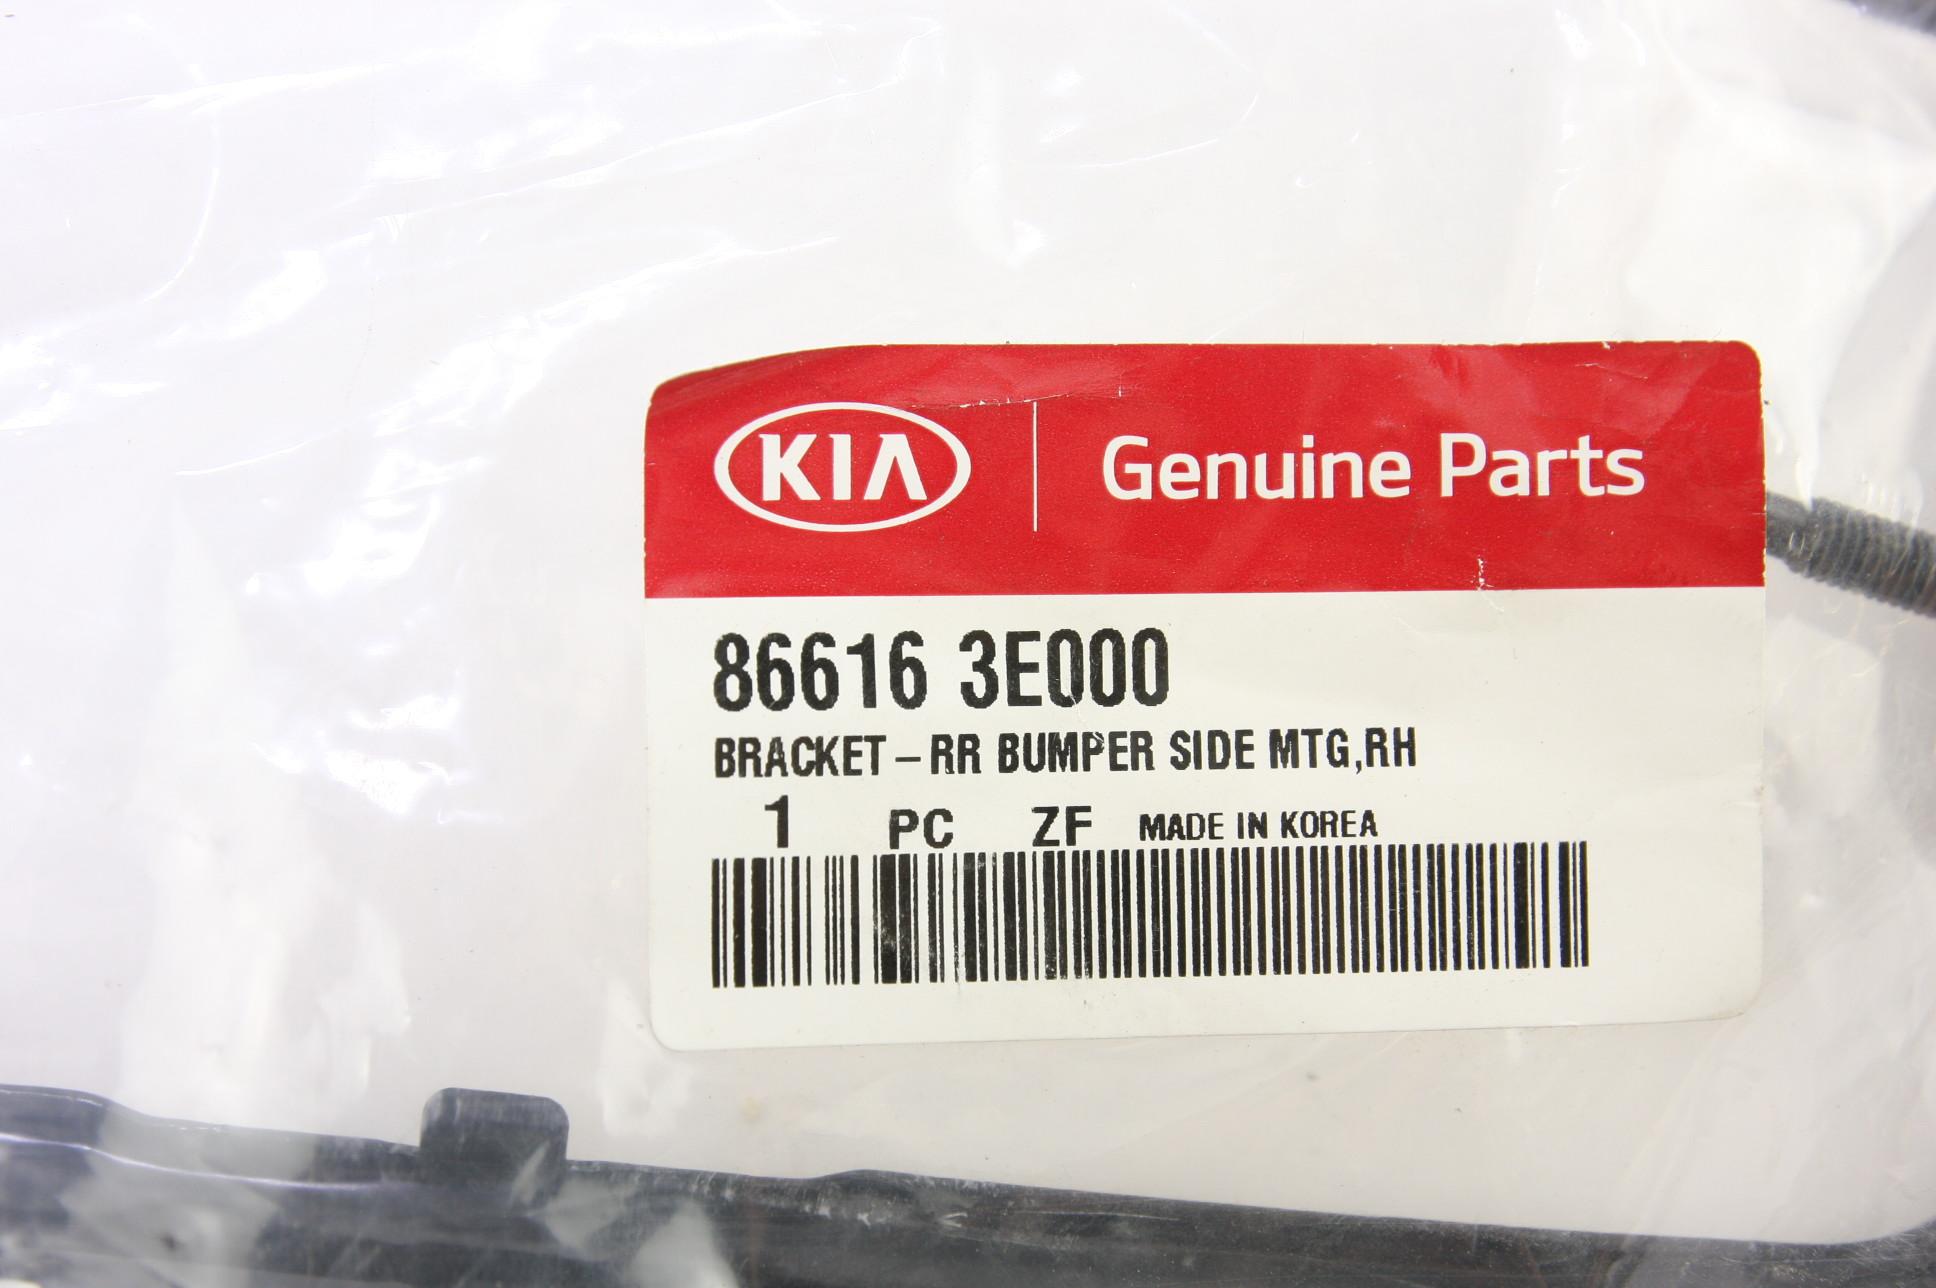 ~ New OEM 866163E000 KIA Rear Bumper Cover Reinforcement Bracket Passengers - image 3